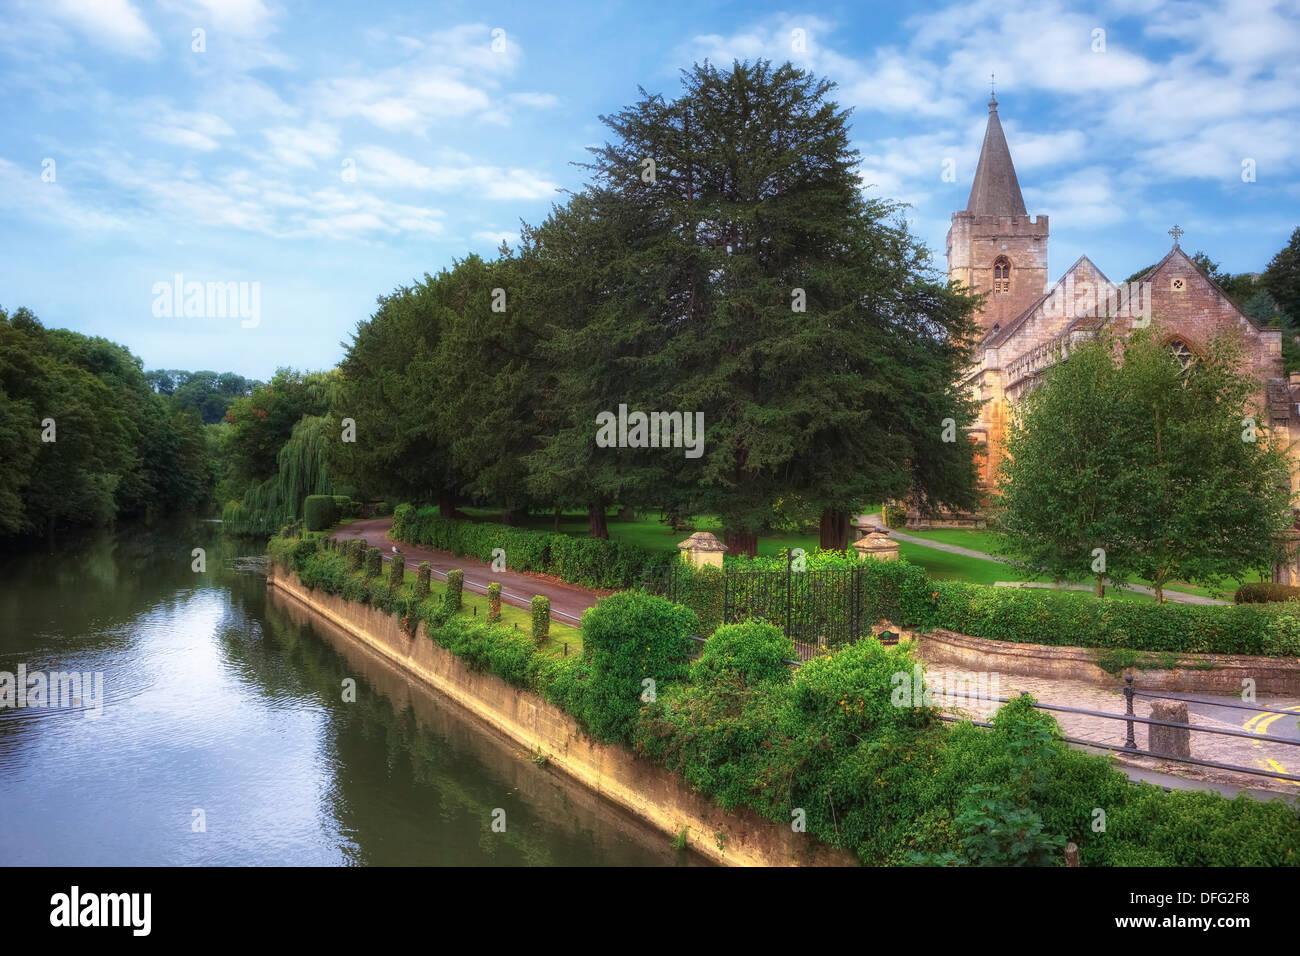 Bradford on Avon, Holy Trinity Church, Wiltshire, Angleterre, Royaume-Uni Photo Stock